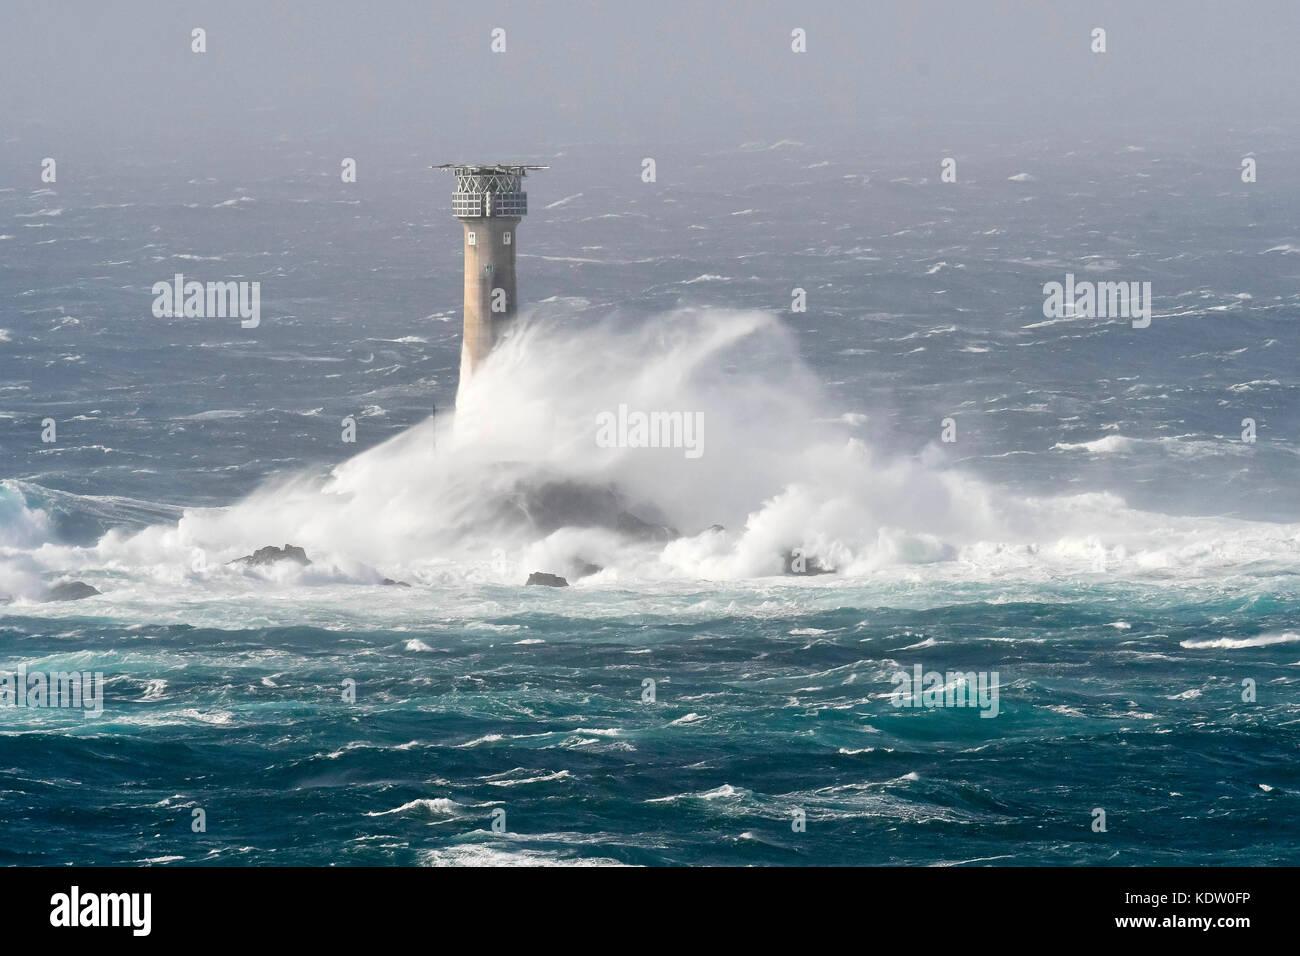 Lands End, Cornwall, UK. 16 Okt, 2017. de Wetter. Gale force Winds aus ex Hurrikan ophelia Peitschen riesige stürmische Stockbild